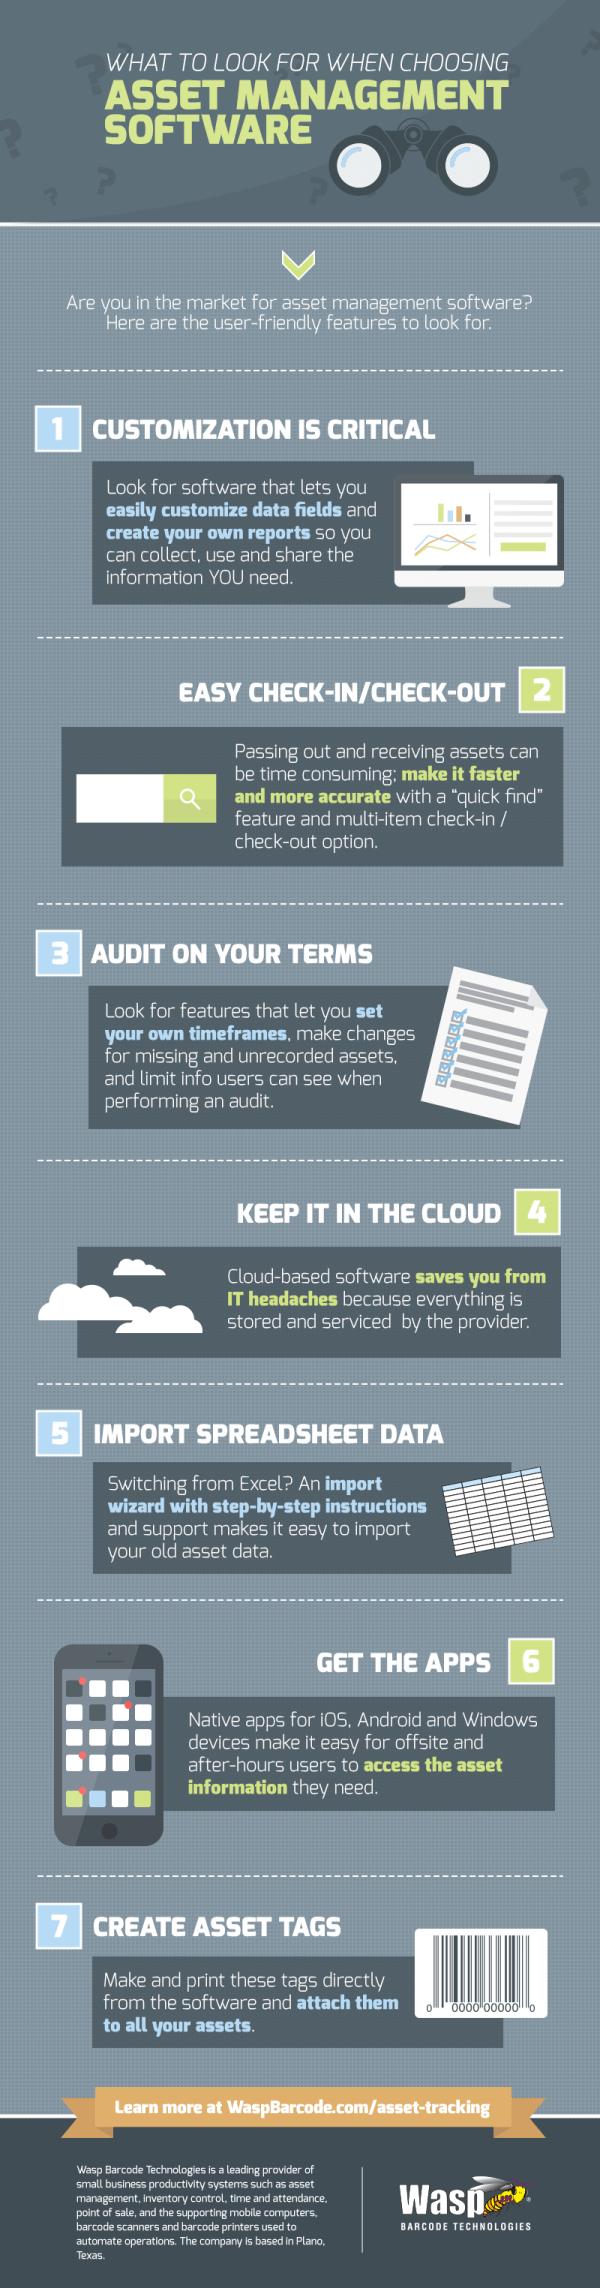 Asset Management Infographic Thumbnail